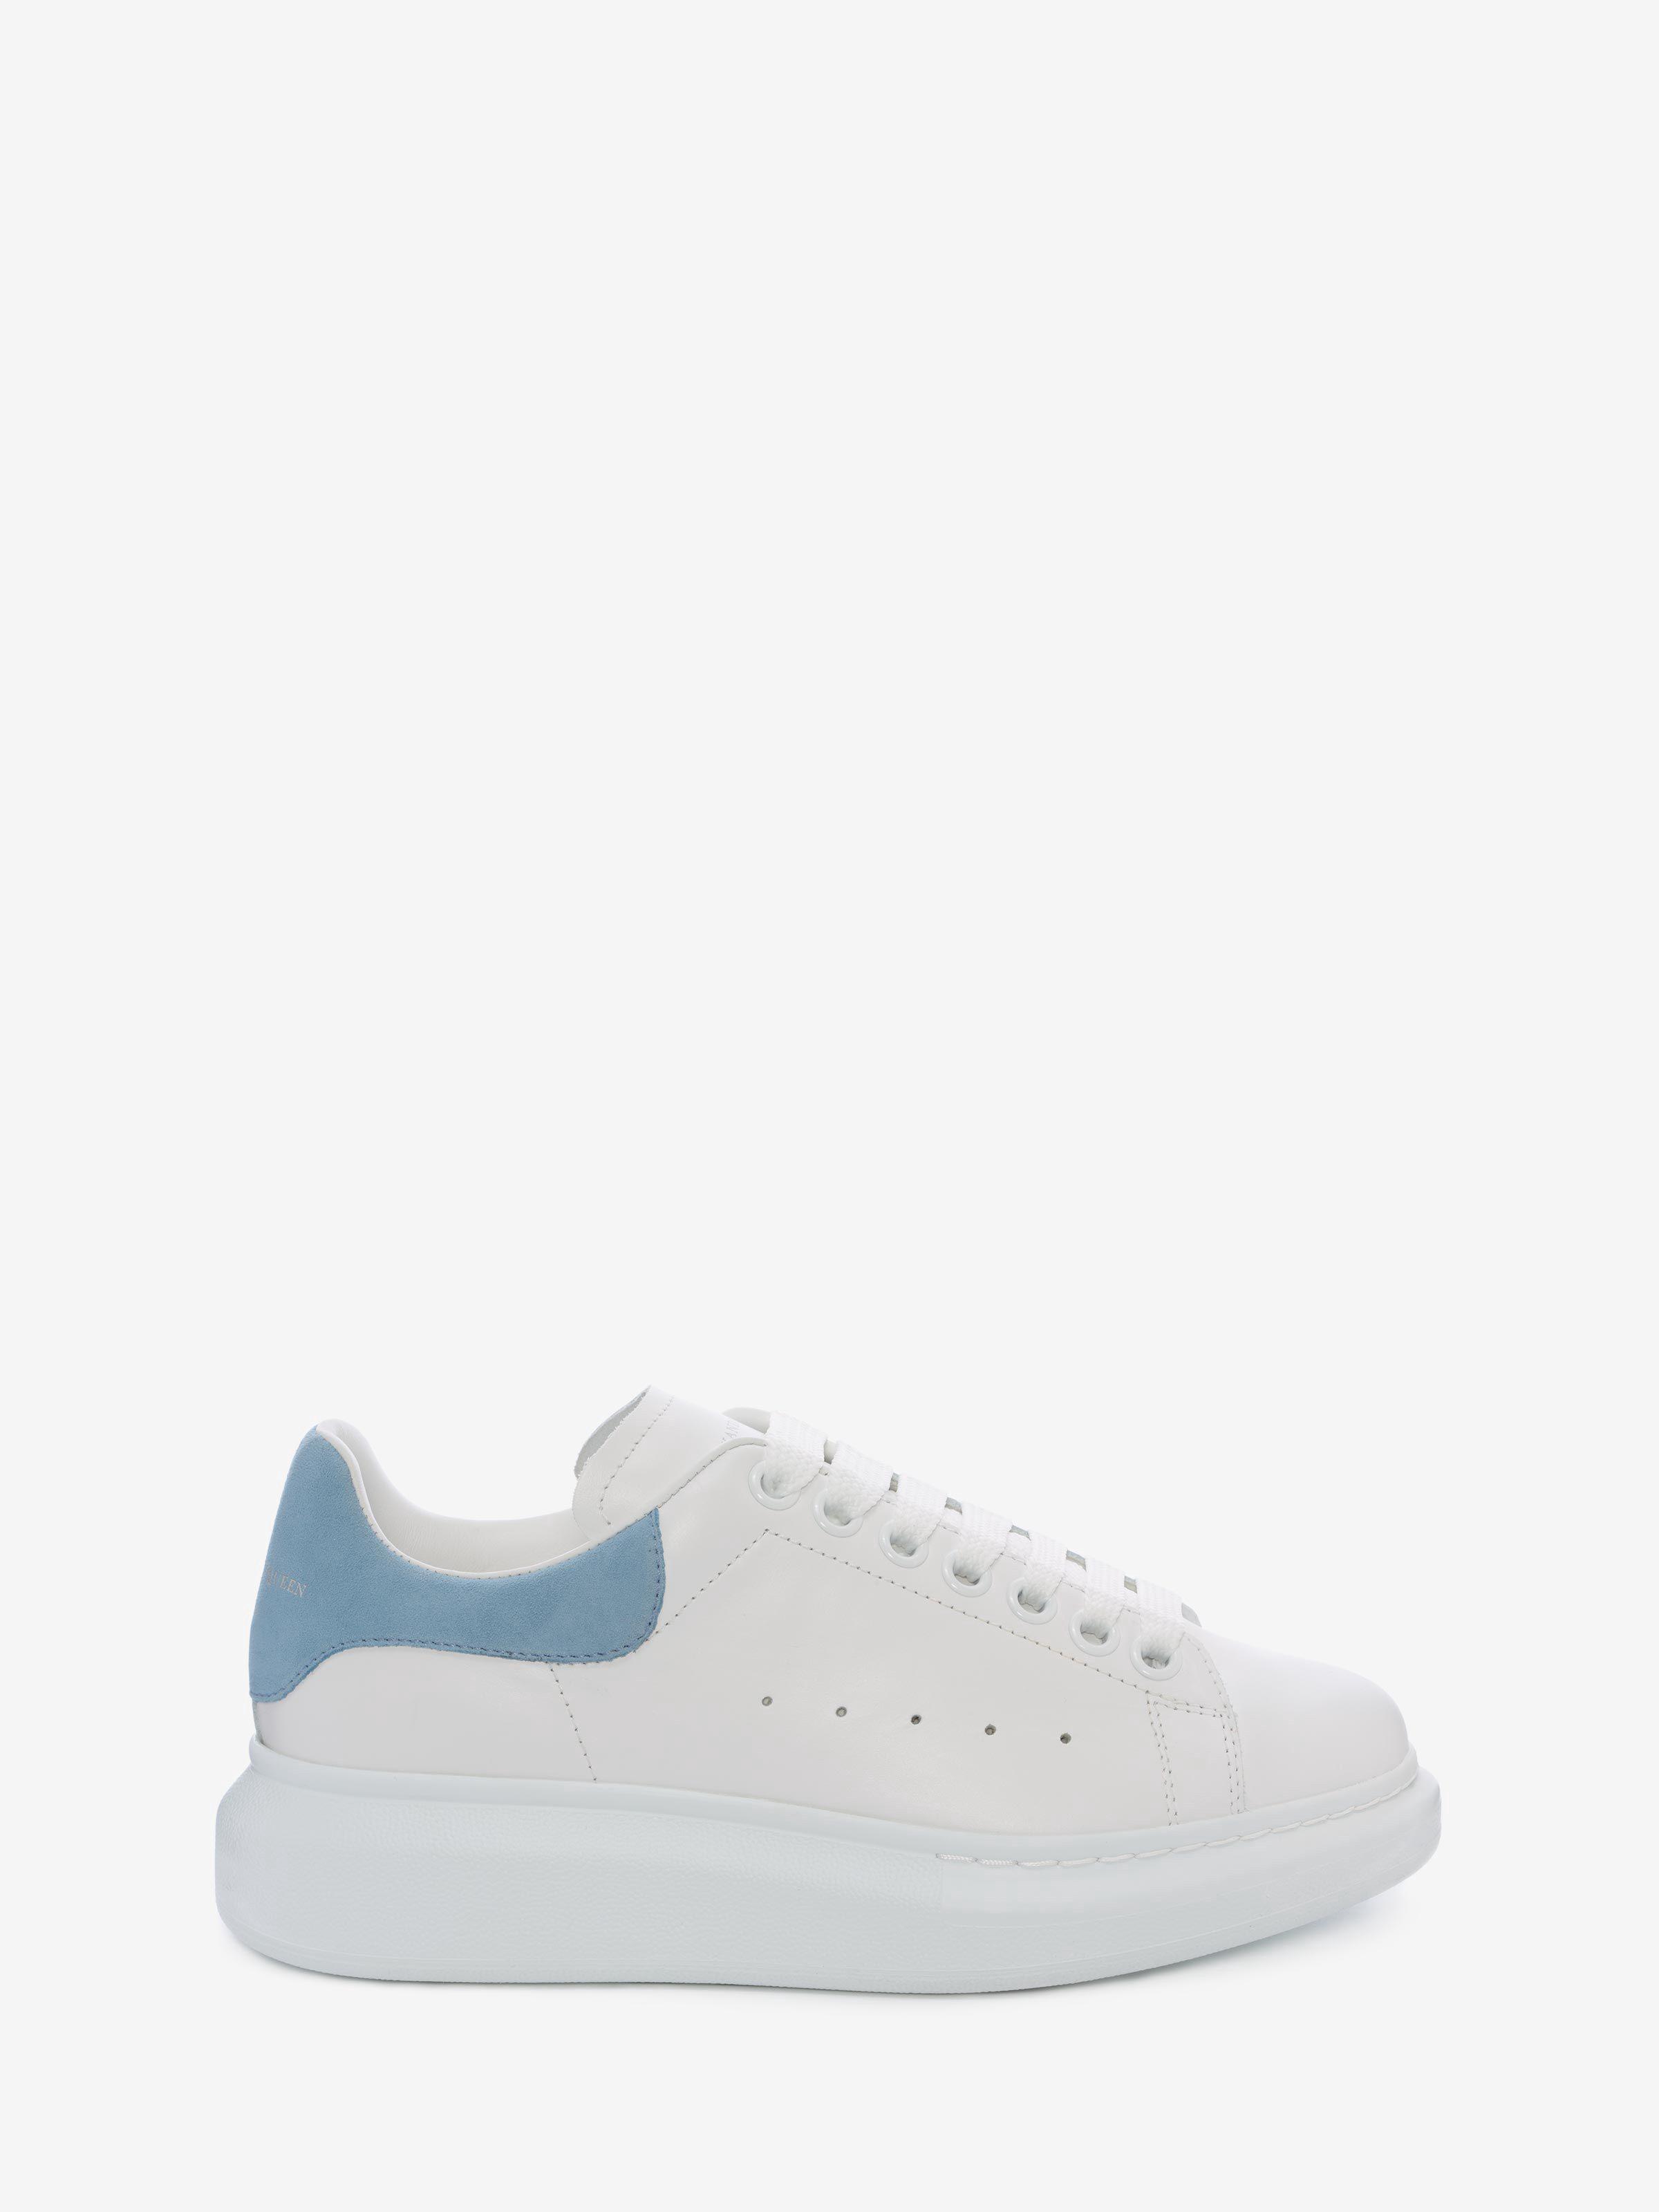 53f294128a88 ALEXANDER MCQUEEN Oversized Sneaker.  alexandermcqueen  shoes ...